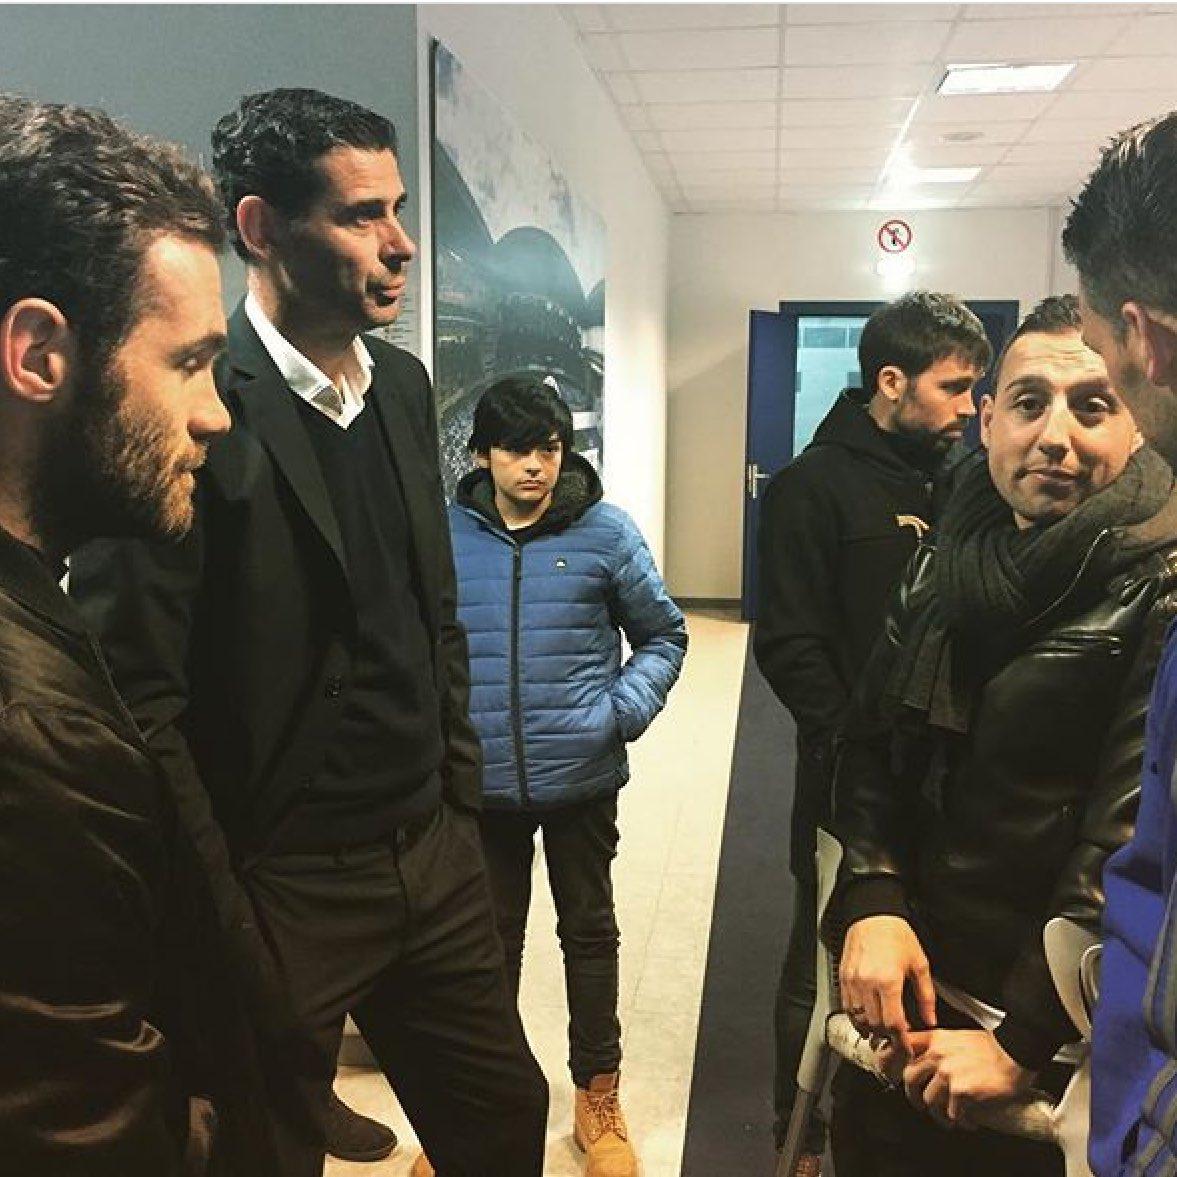 RT @oviedismoinfo: Hierro conversando con Mata y Cazorla. Foto vía @RealOviedo https://t.co/PpmQPRXslg